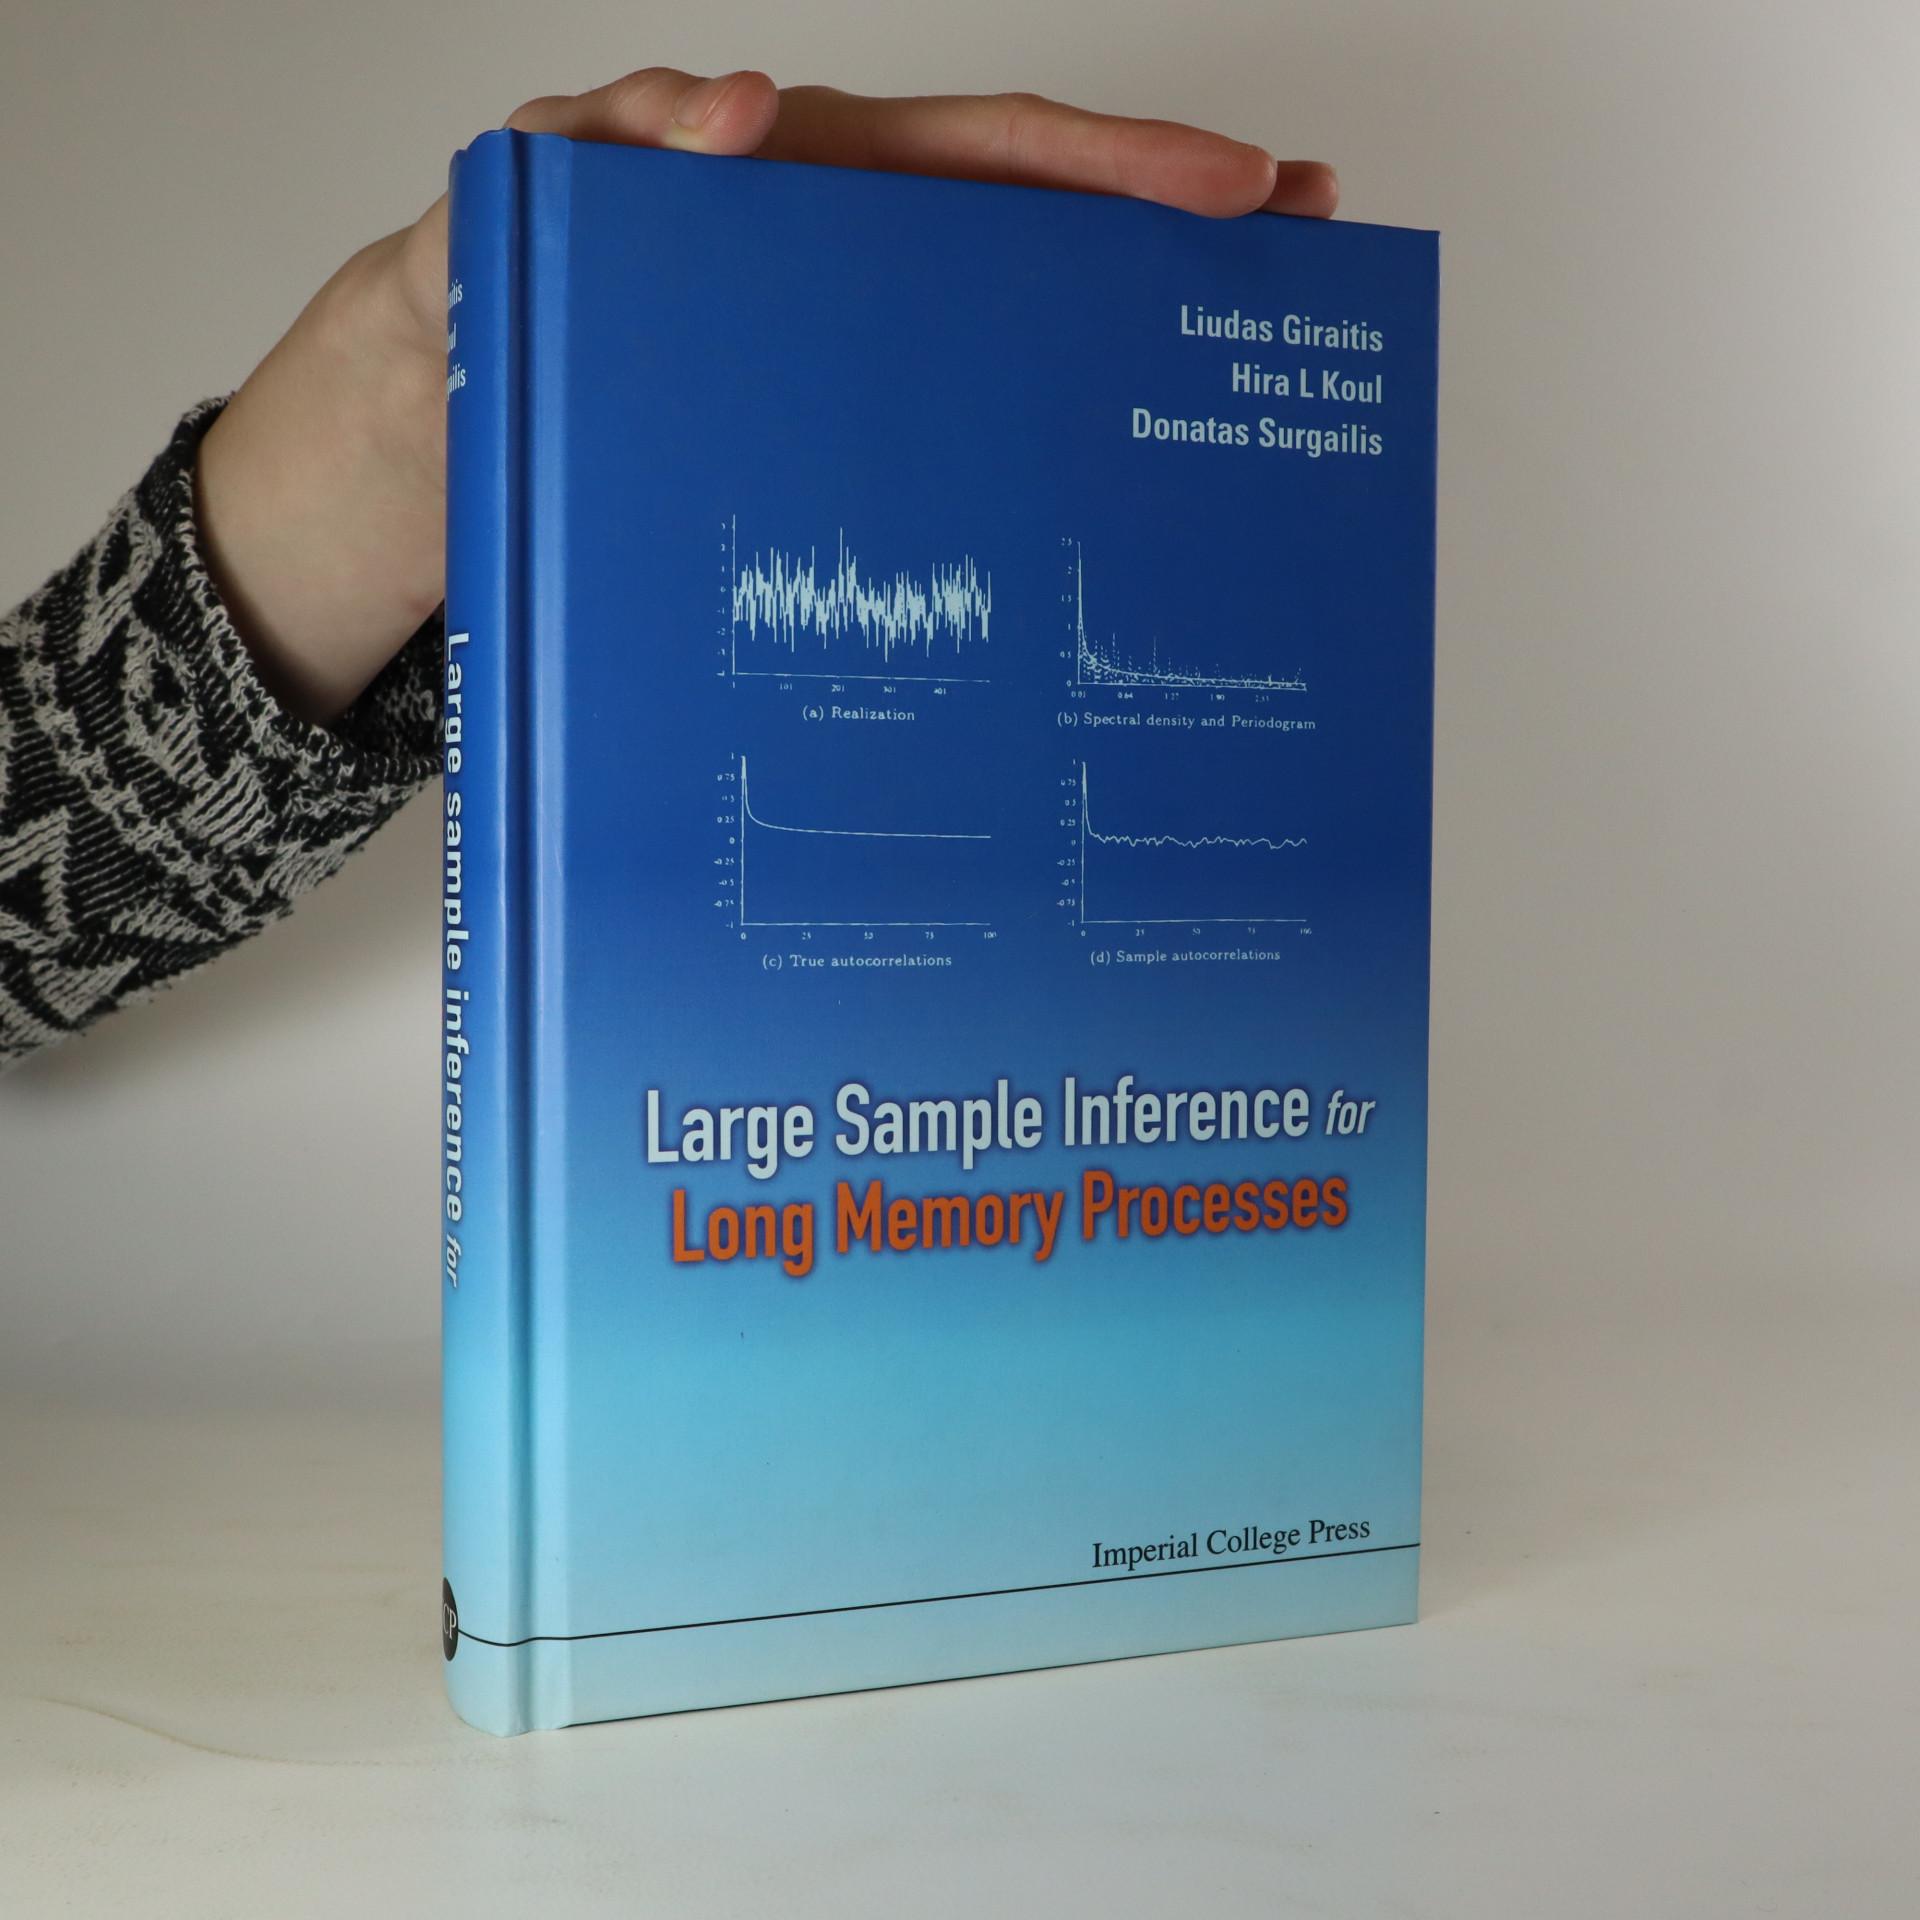 antikvární kniha Large Sample Inference for Long Memory Processes, neuveden